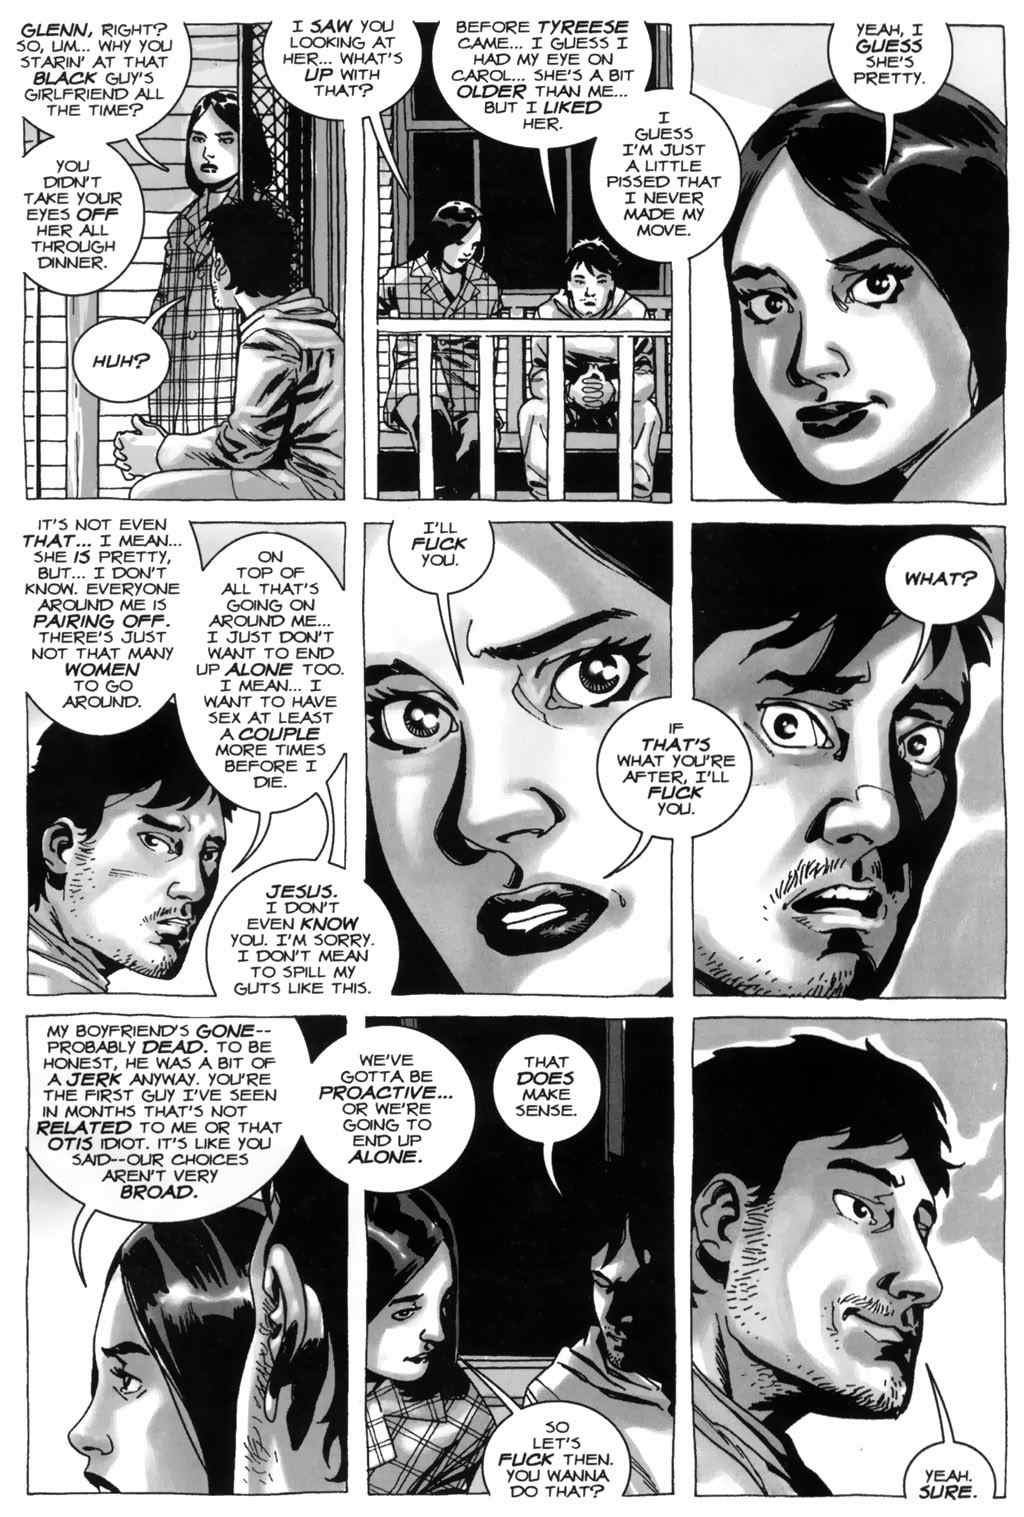 Read Comics Online Free - The Walking Dead - Chapter 010